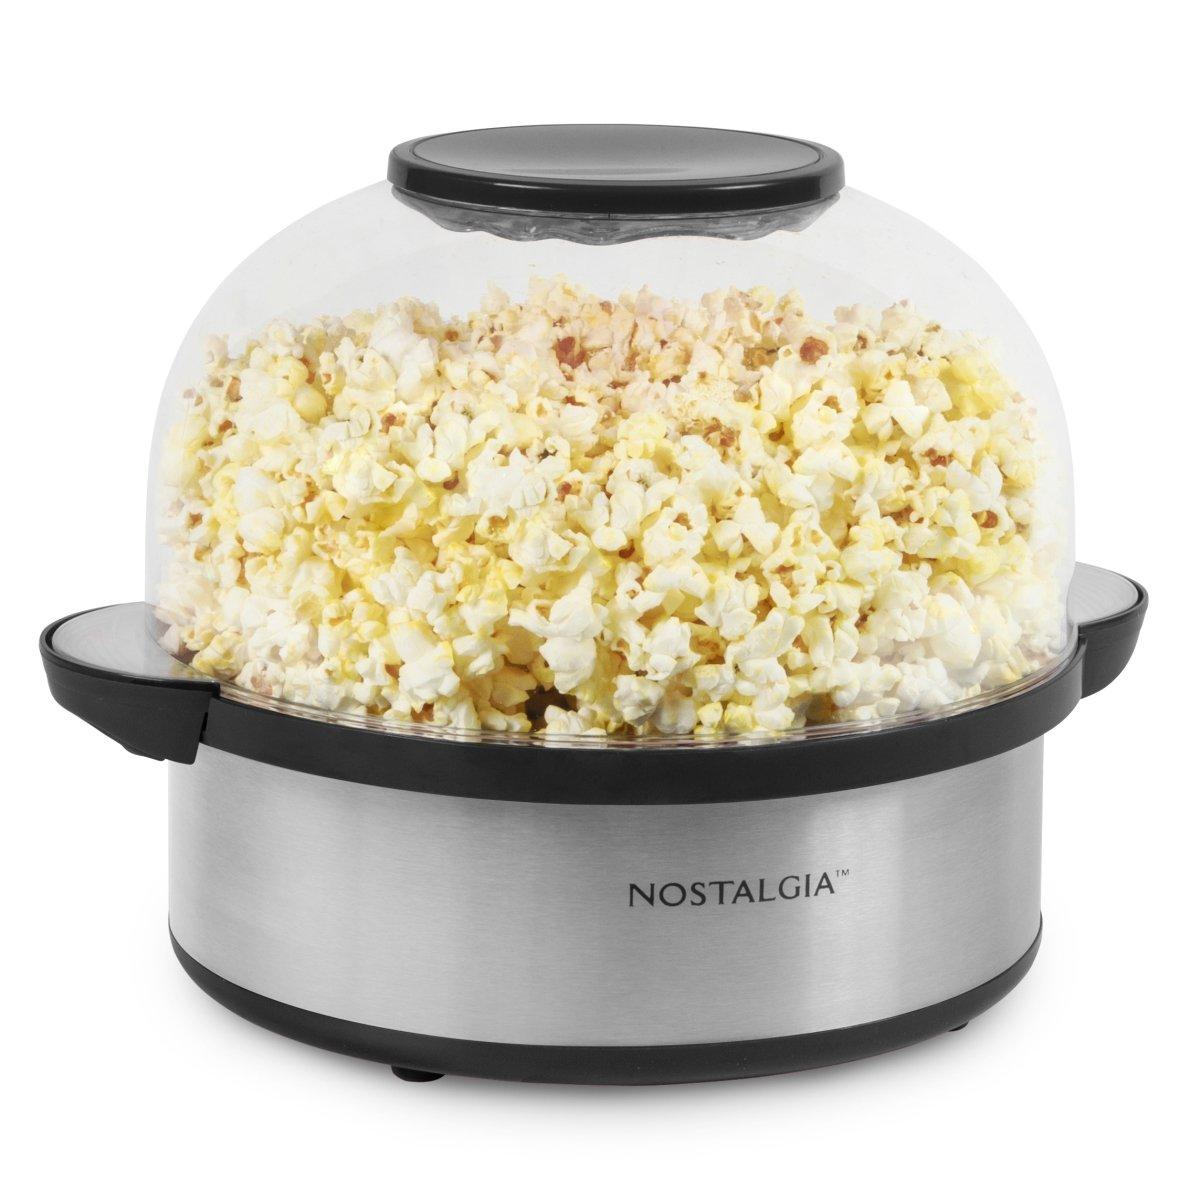 Nostalgia 6-Quart Stainless Steel Stirring Speed Popcorn Popper